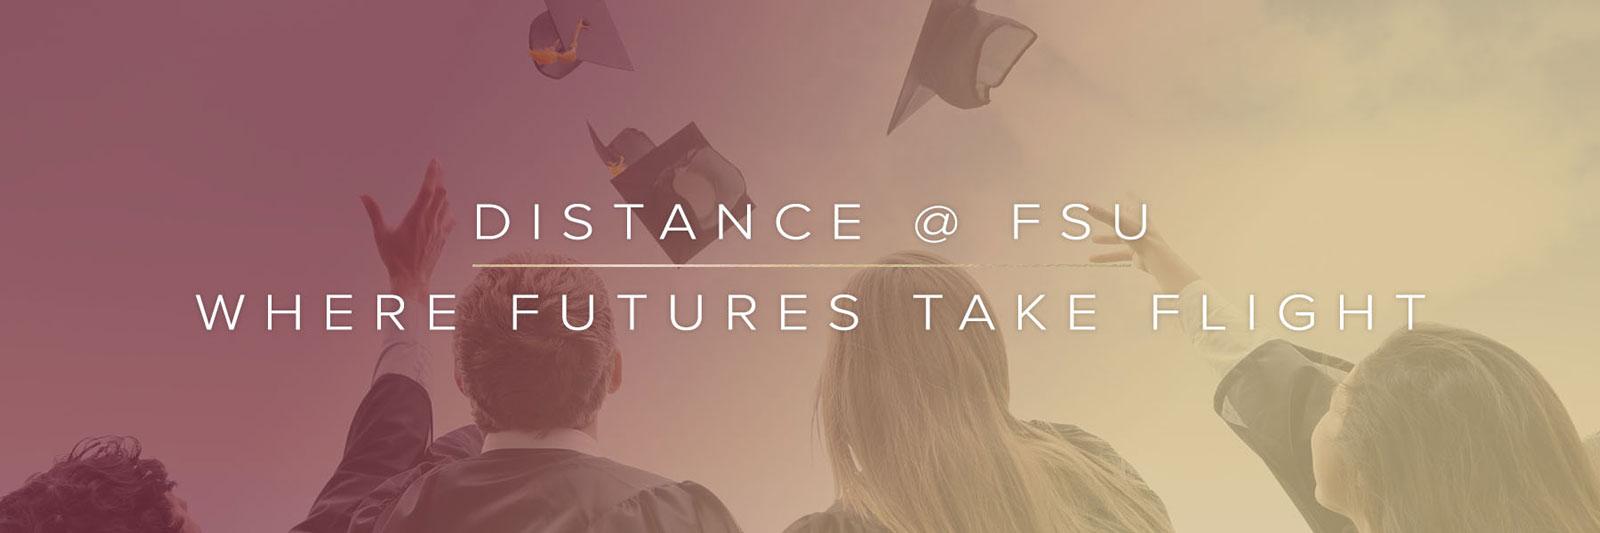 Programs Distance Fsu